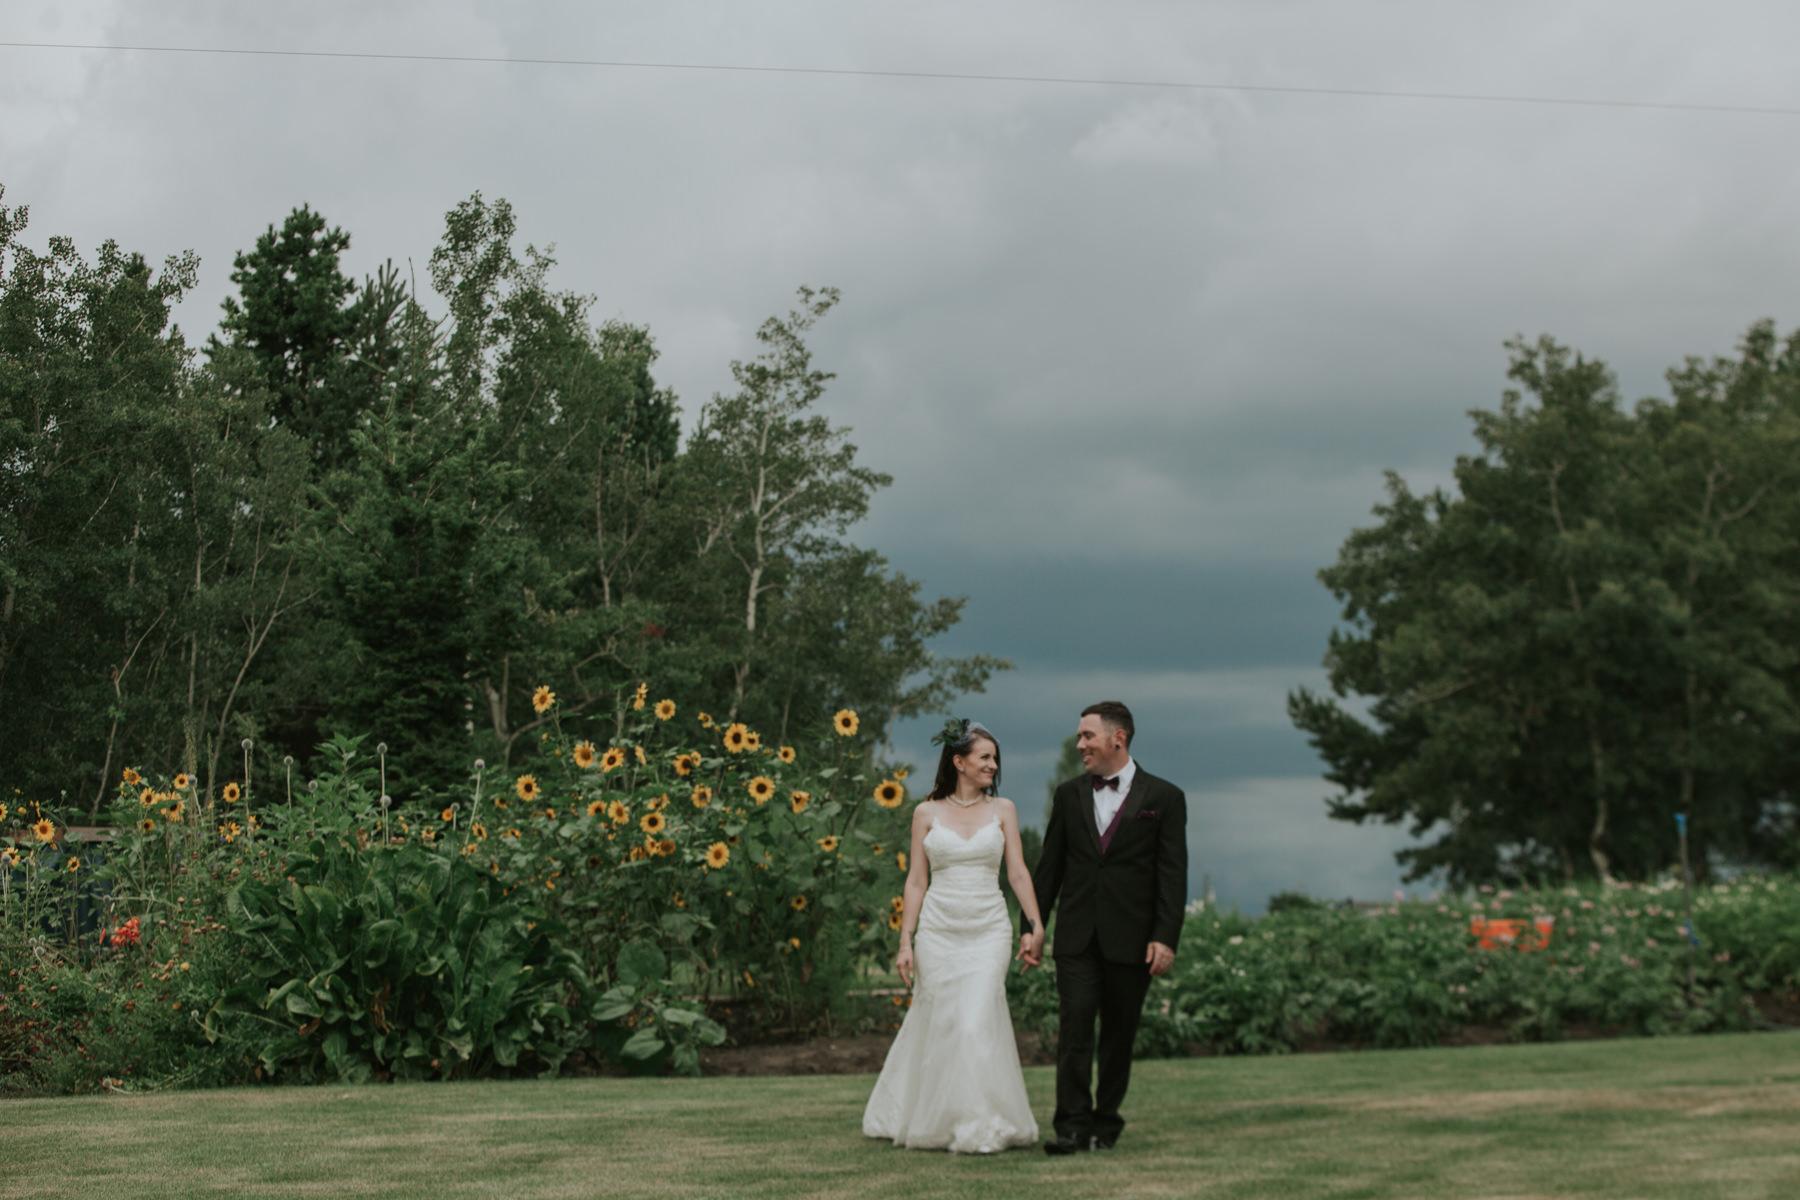 Vancouver Wedding Photographer Pam (53).jpg